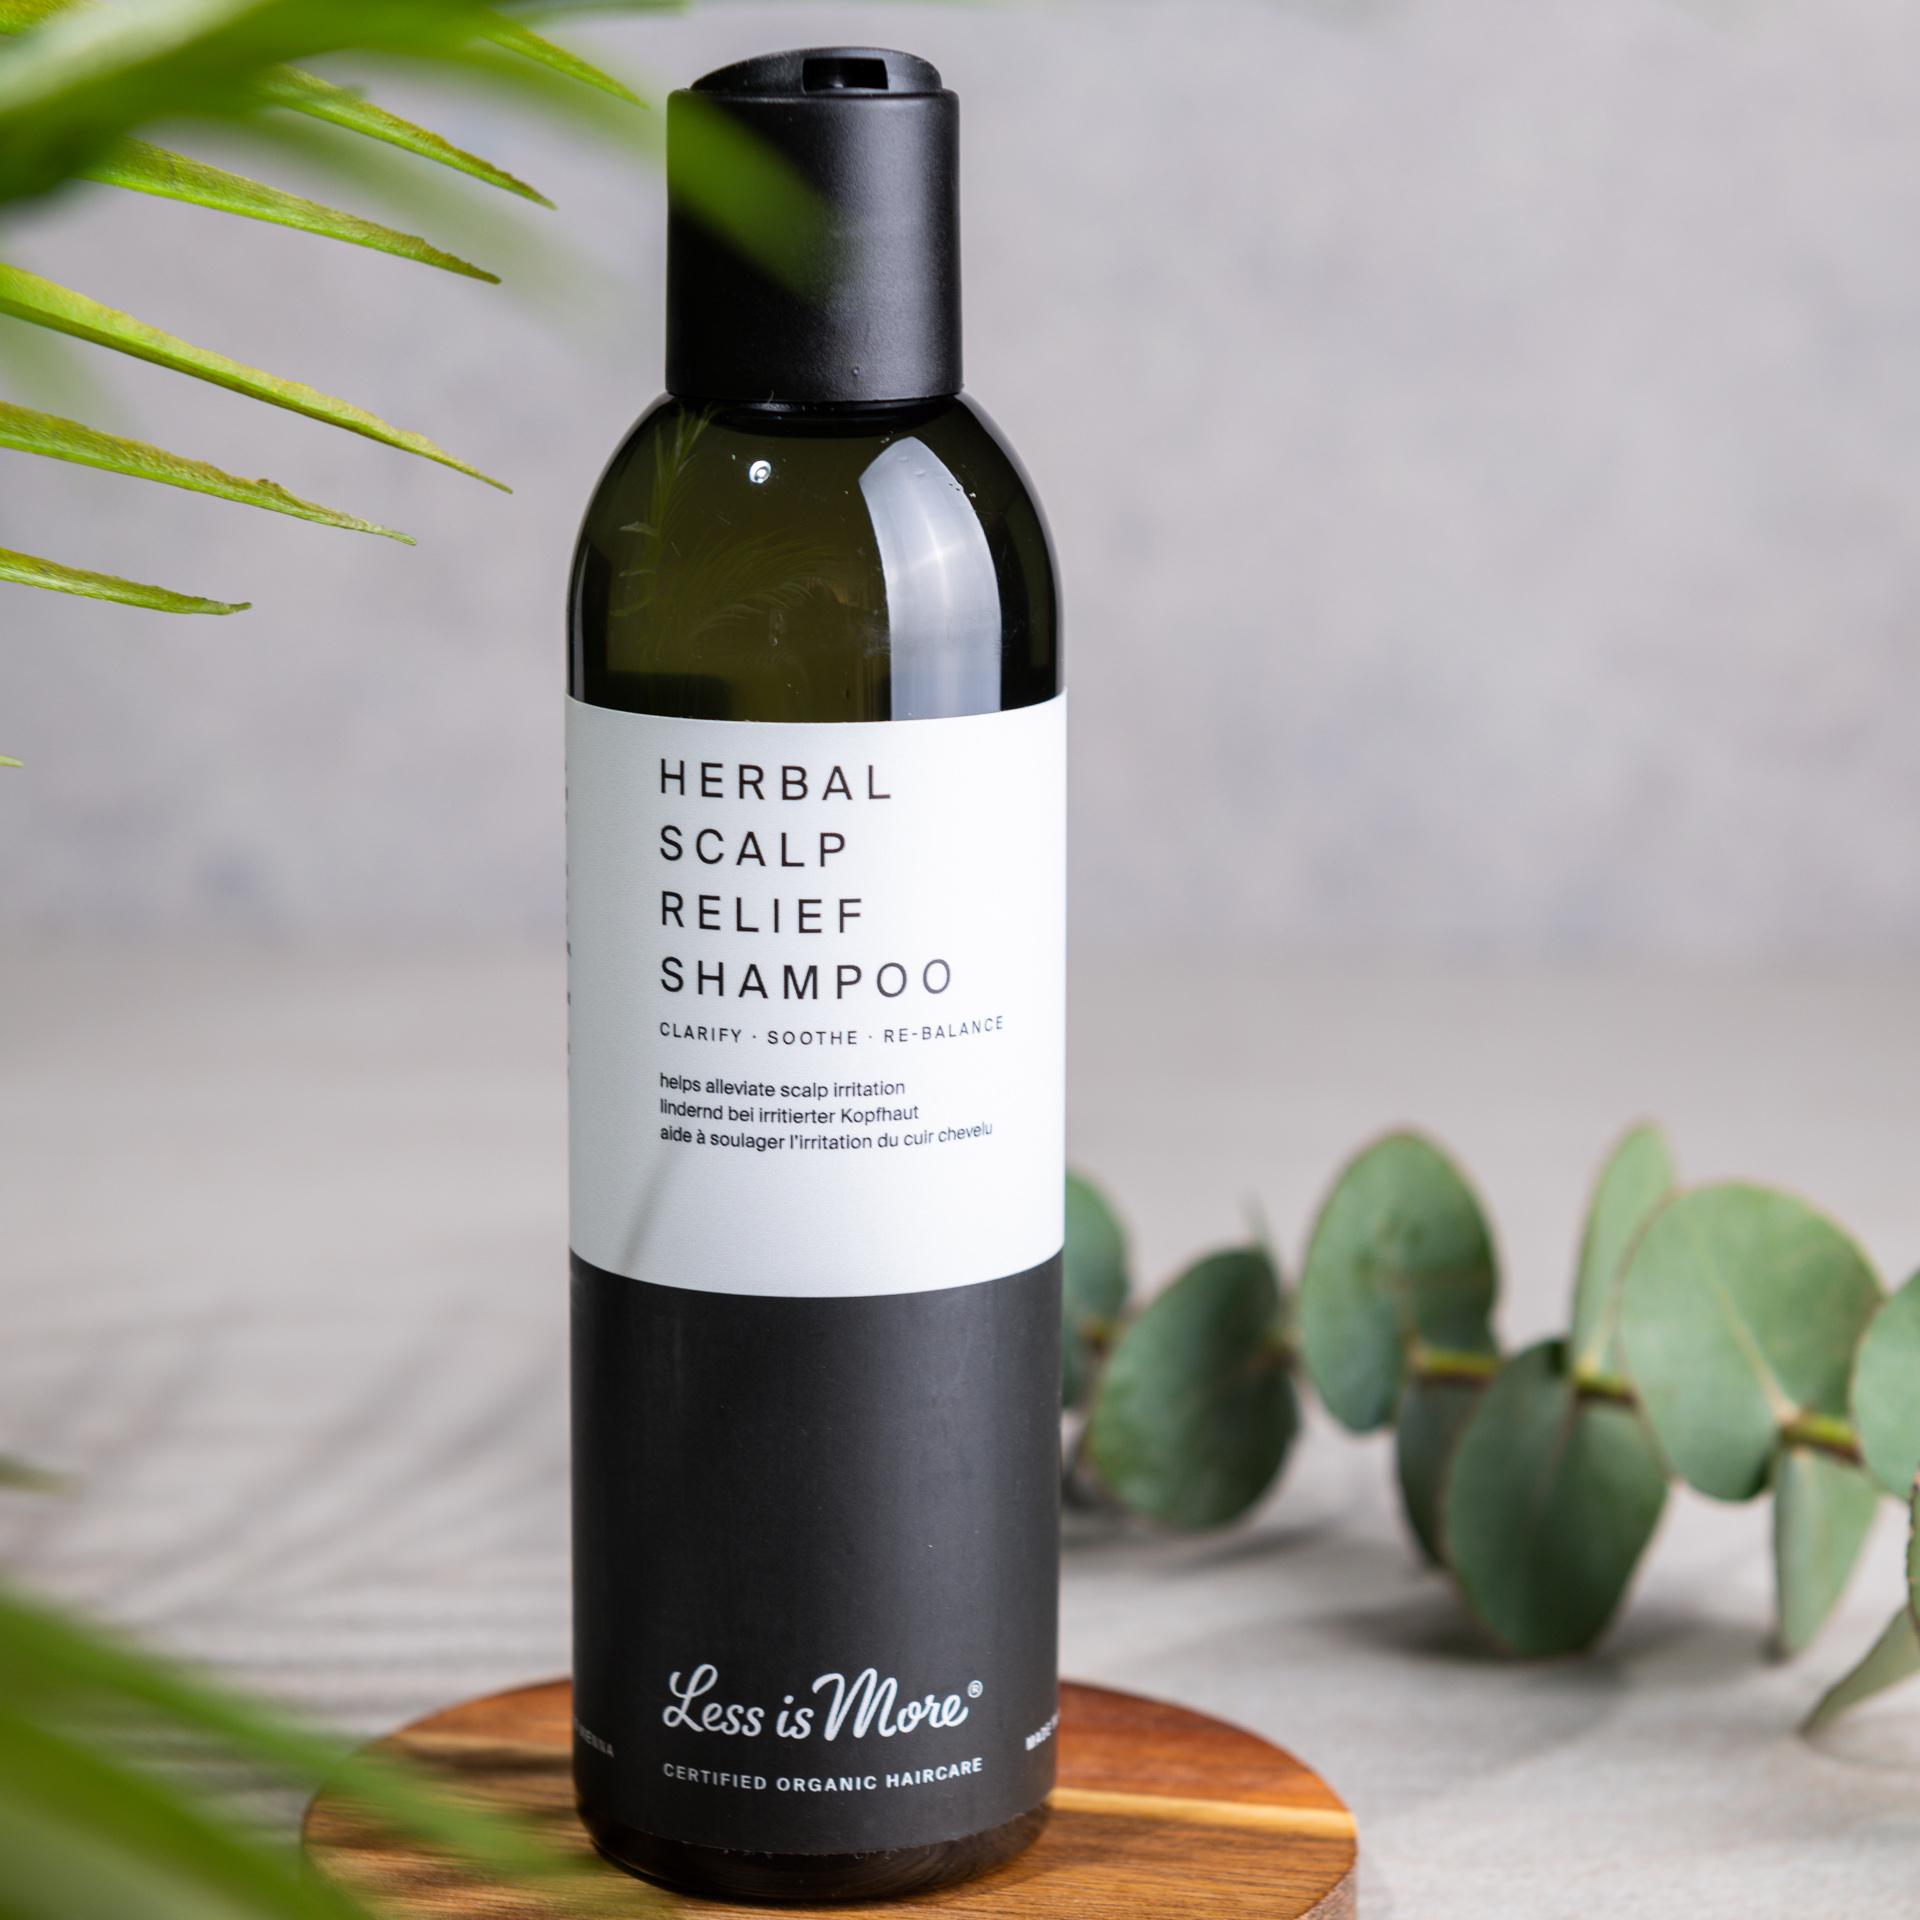 Herbal Scalp Relief Shampoo